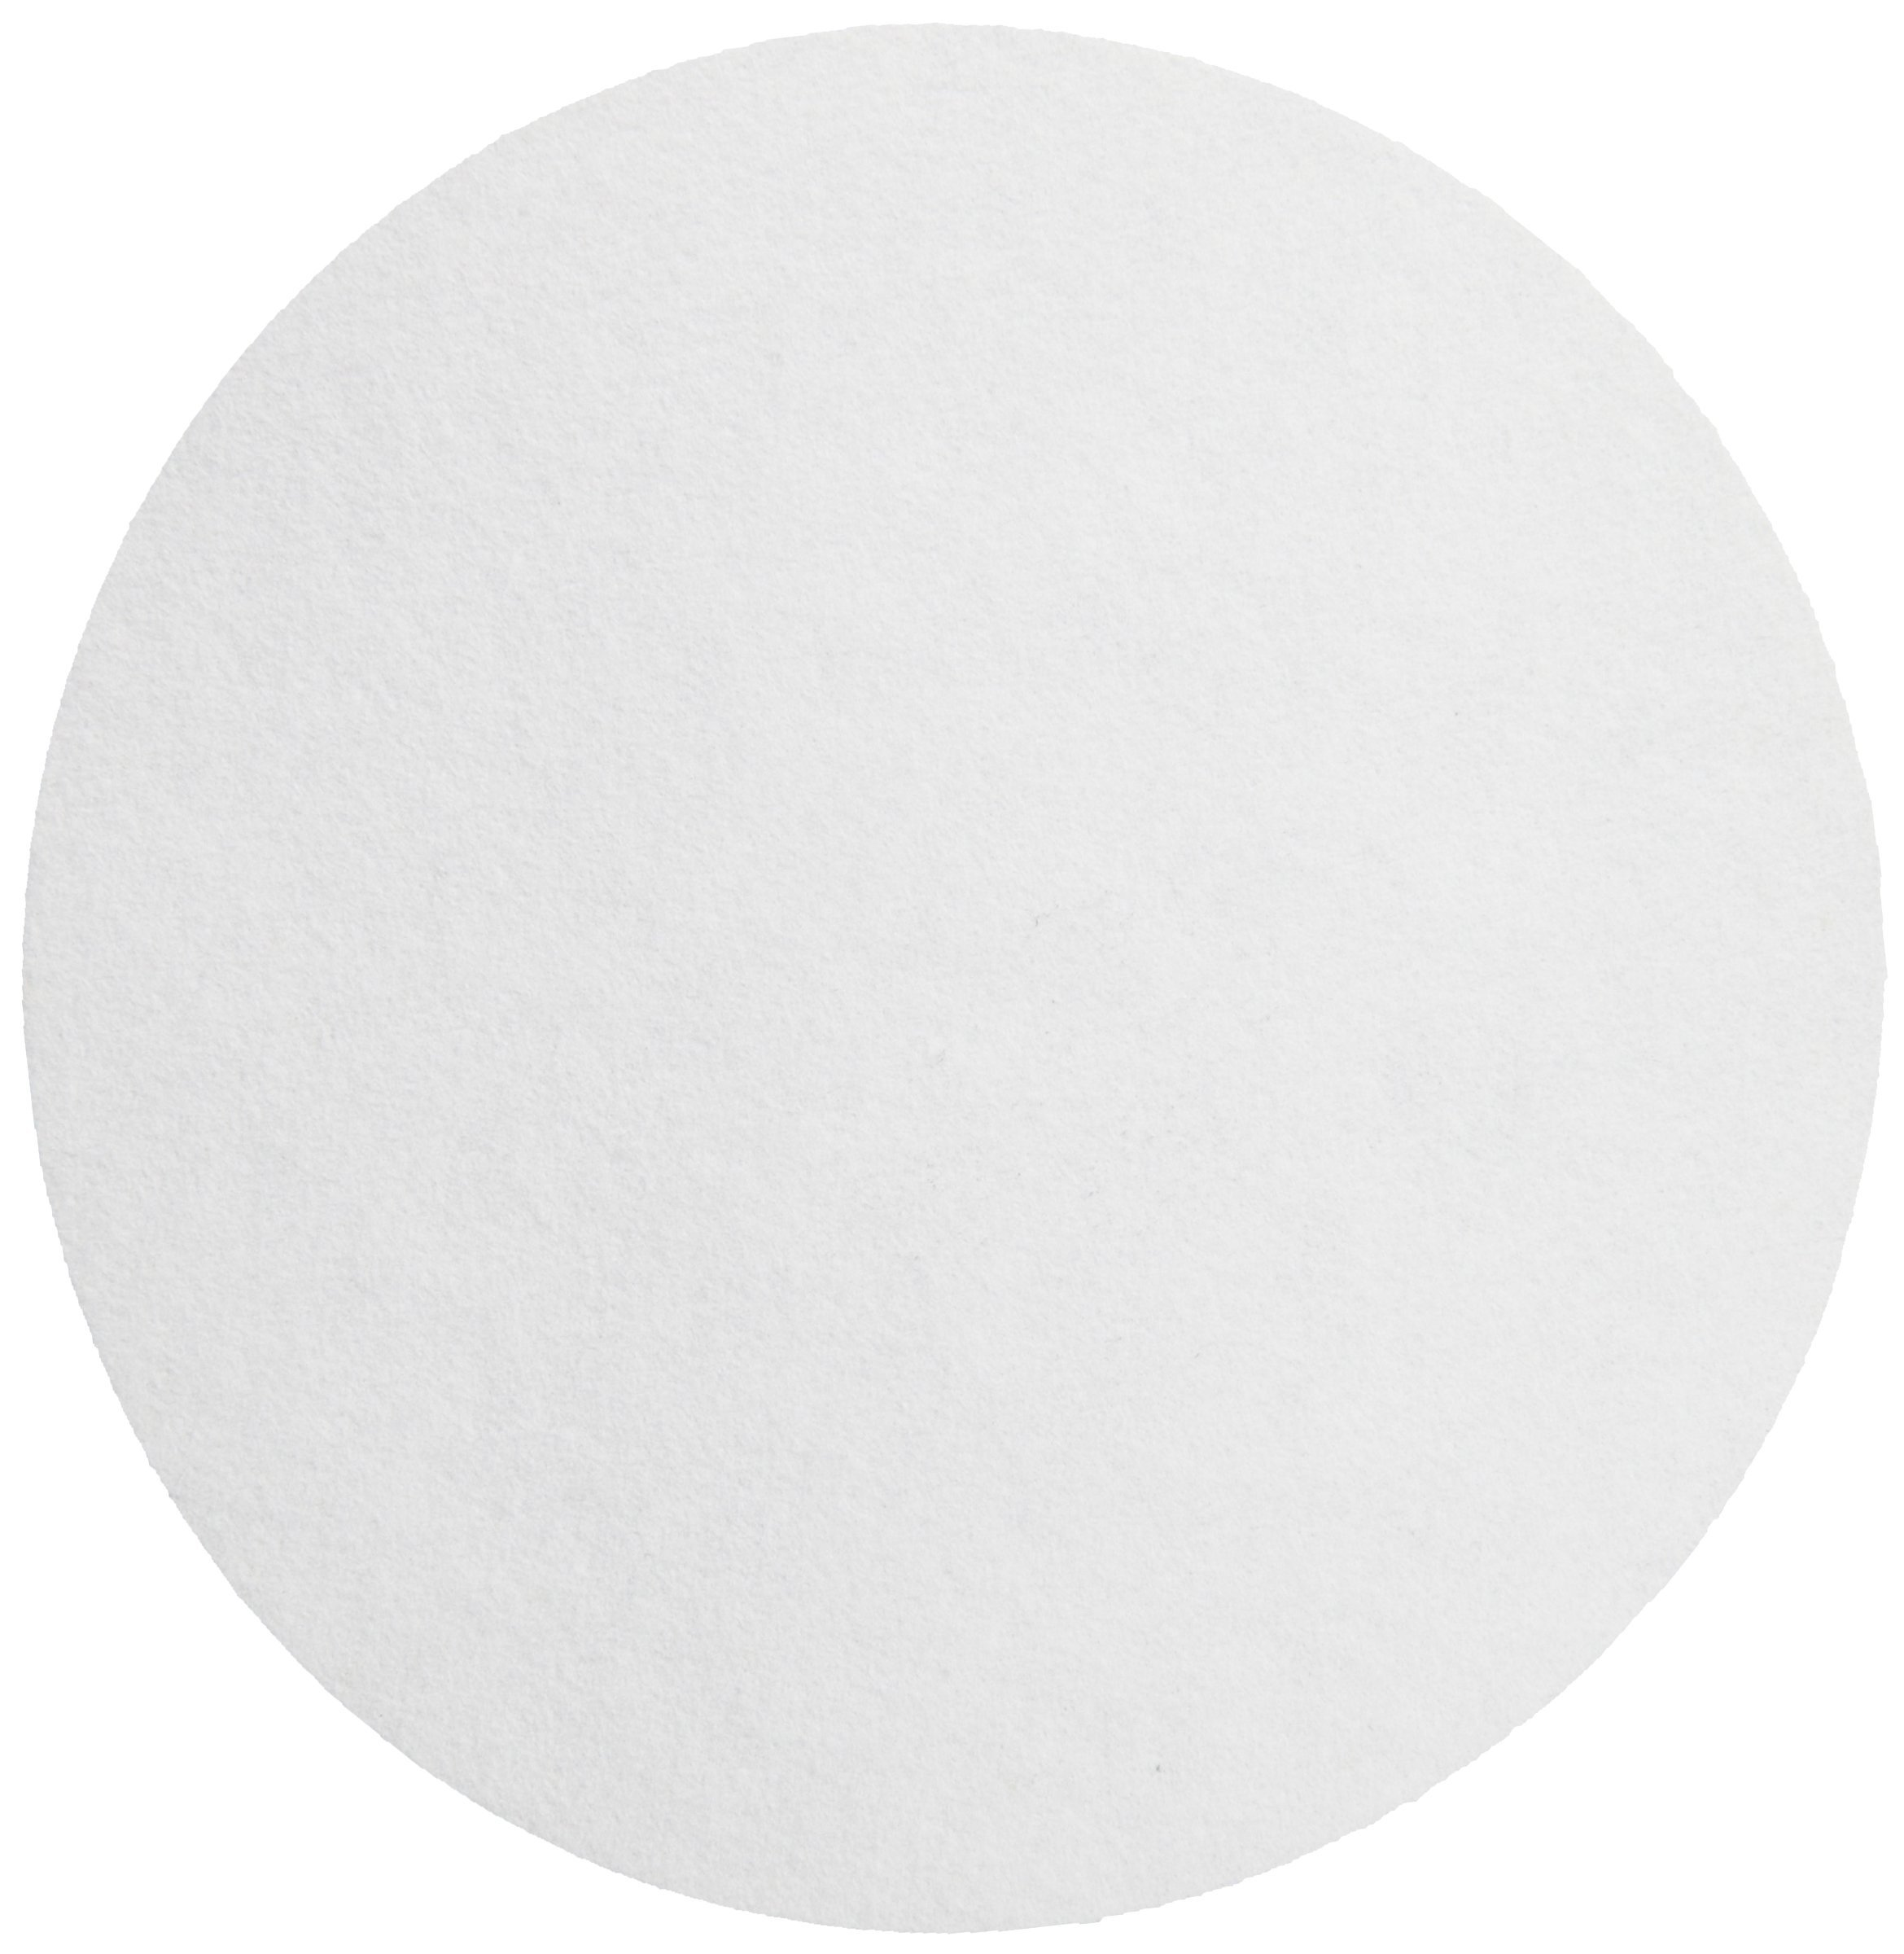 Whatman 1452-090 Hardened Low Ash Quantitative Filter Paper, 52 9.0cm Diameter, 7 Micron, Grade 52 (Pack of 100)